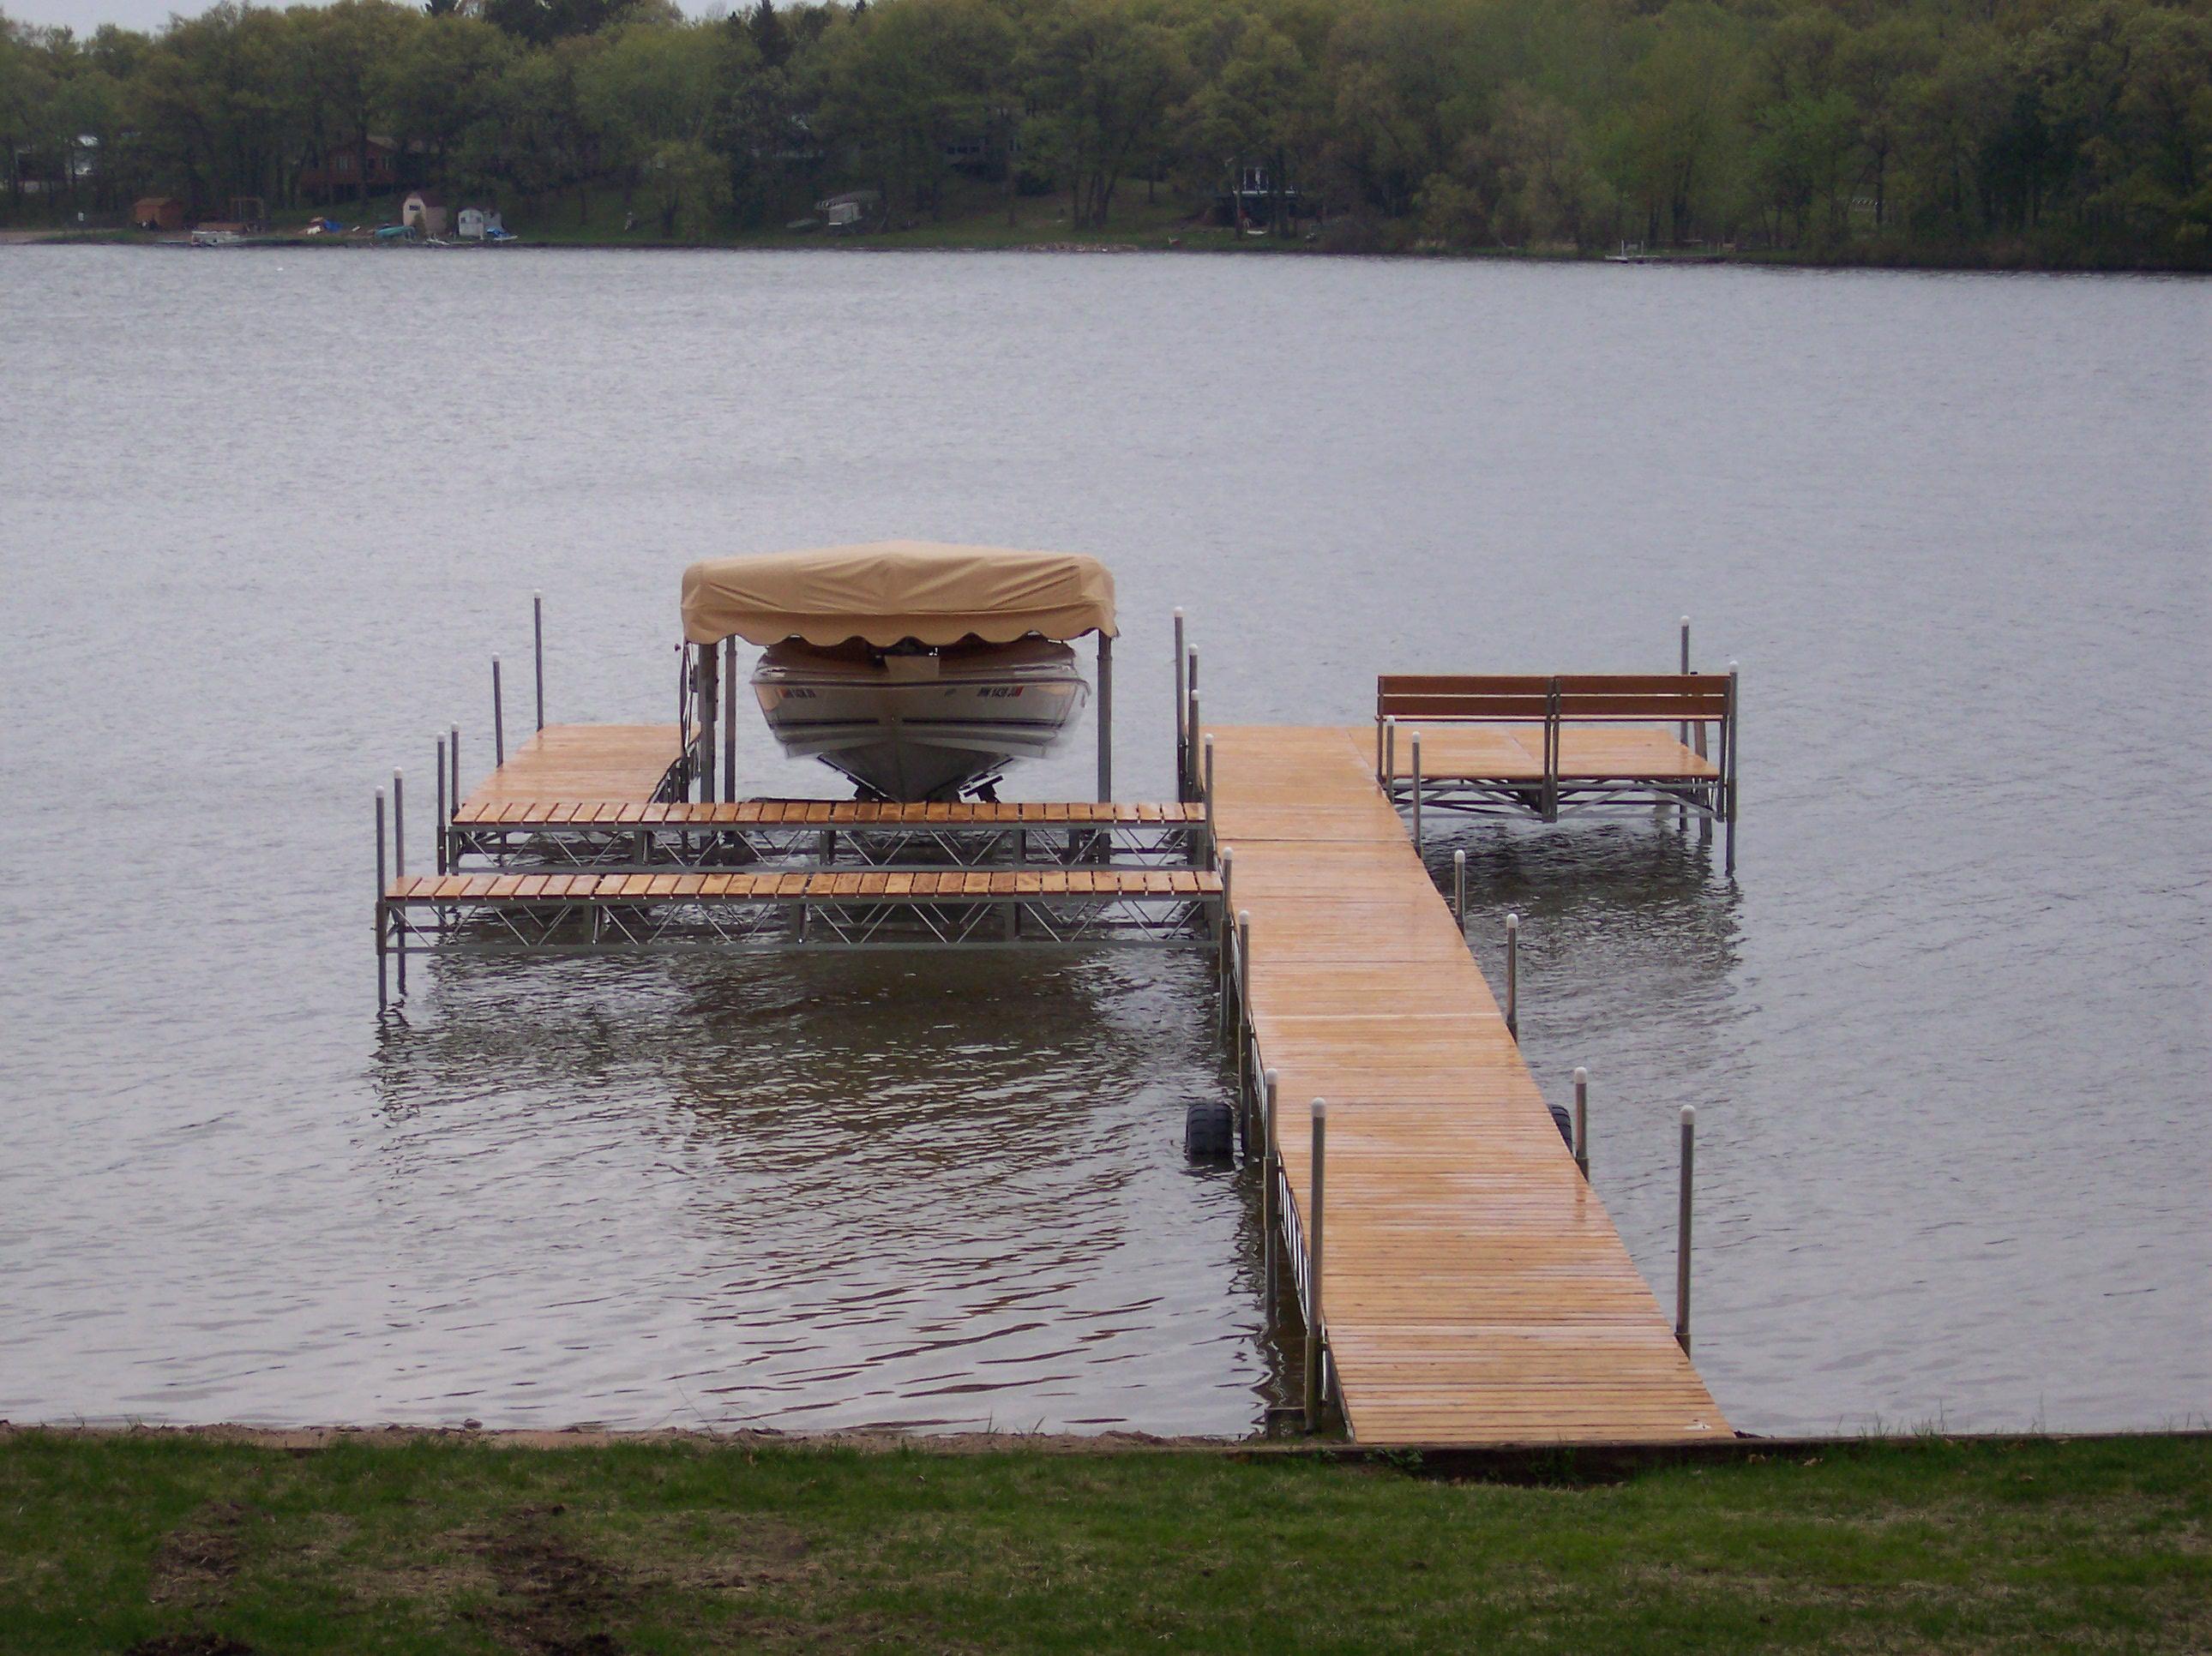 Roll in Docks, boat lifts, aluminum docks, paradise pad